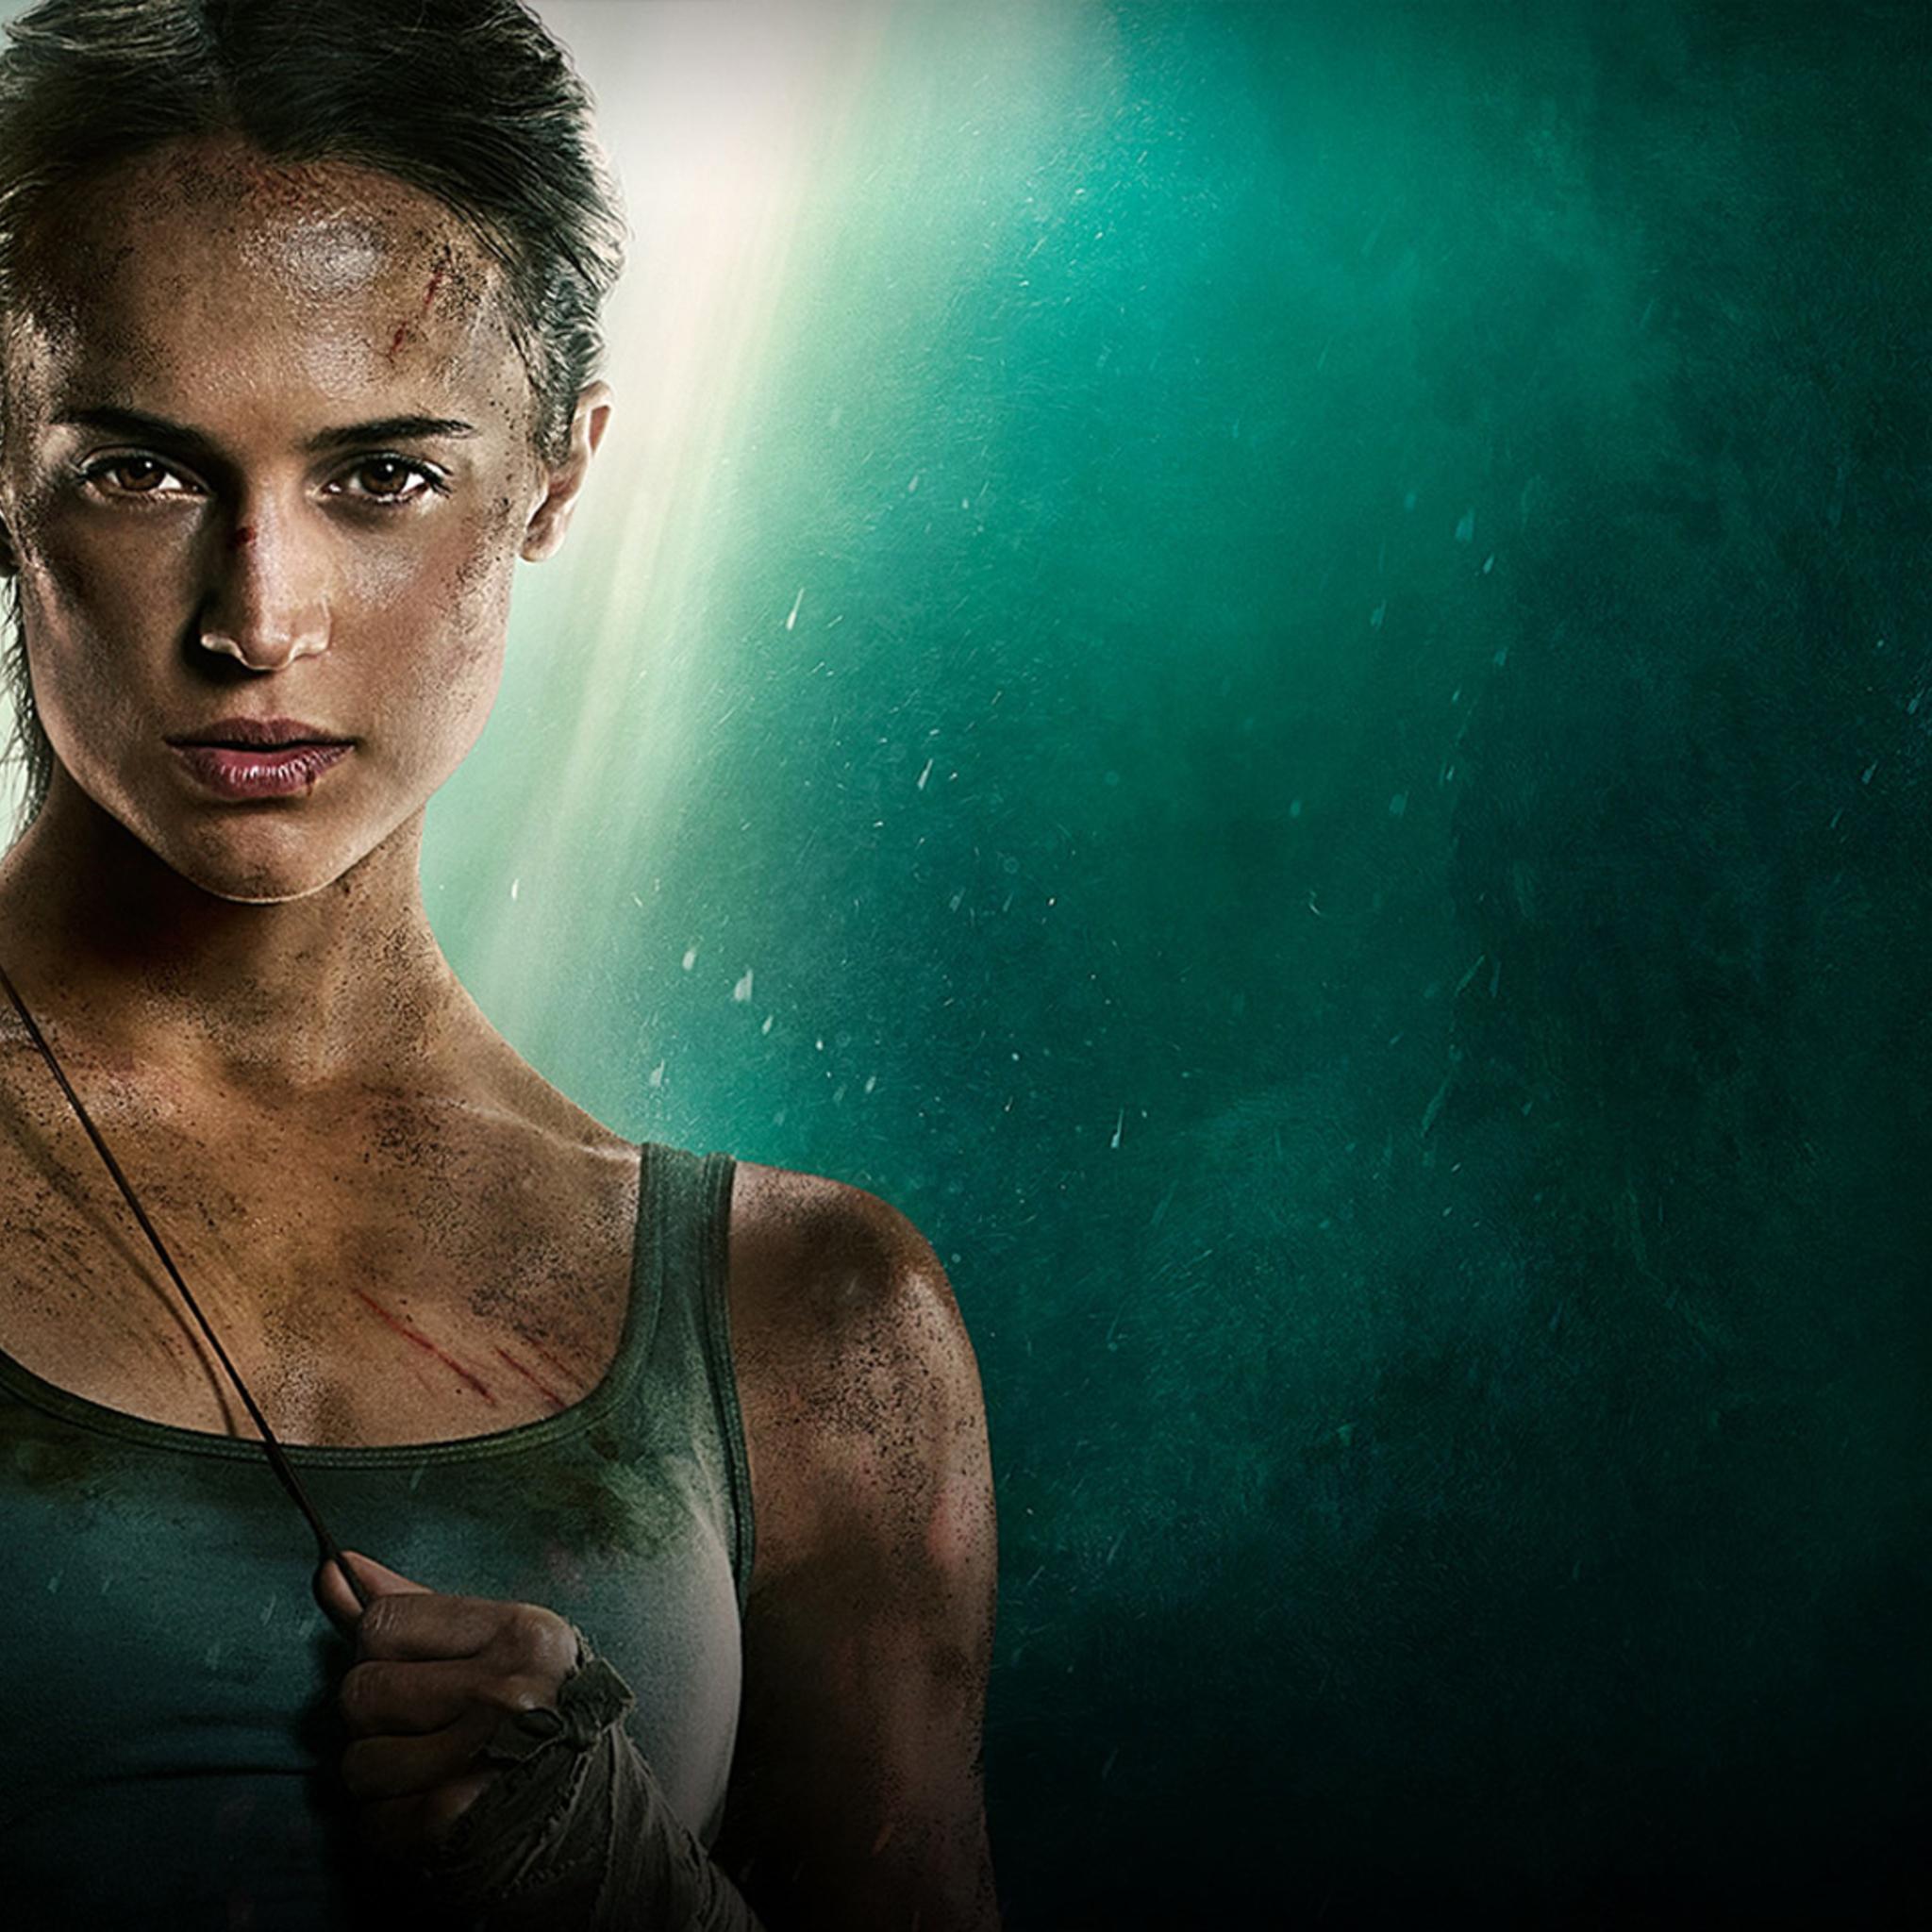 3d Tomb Raider Wallpaper: 2048x2048 Tomb Raider 2018 Movie Alicia Vikander Poster